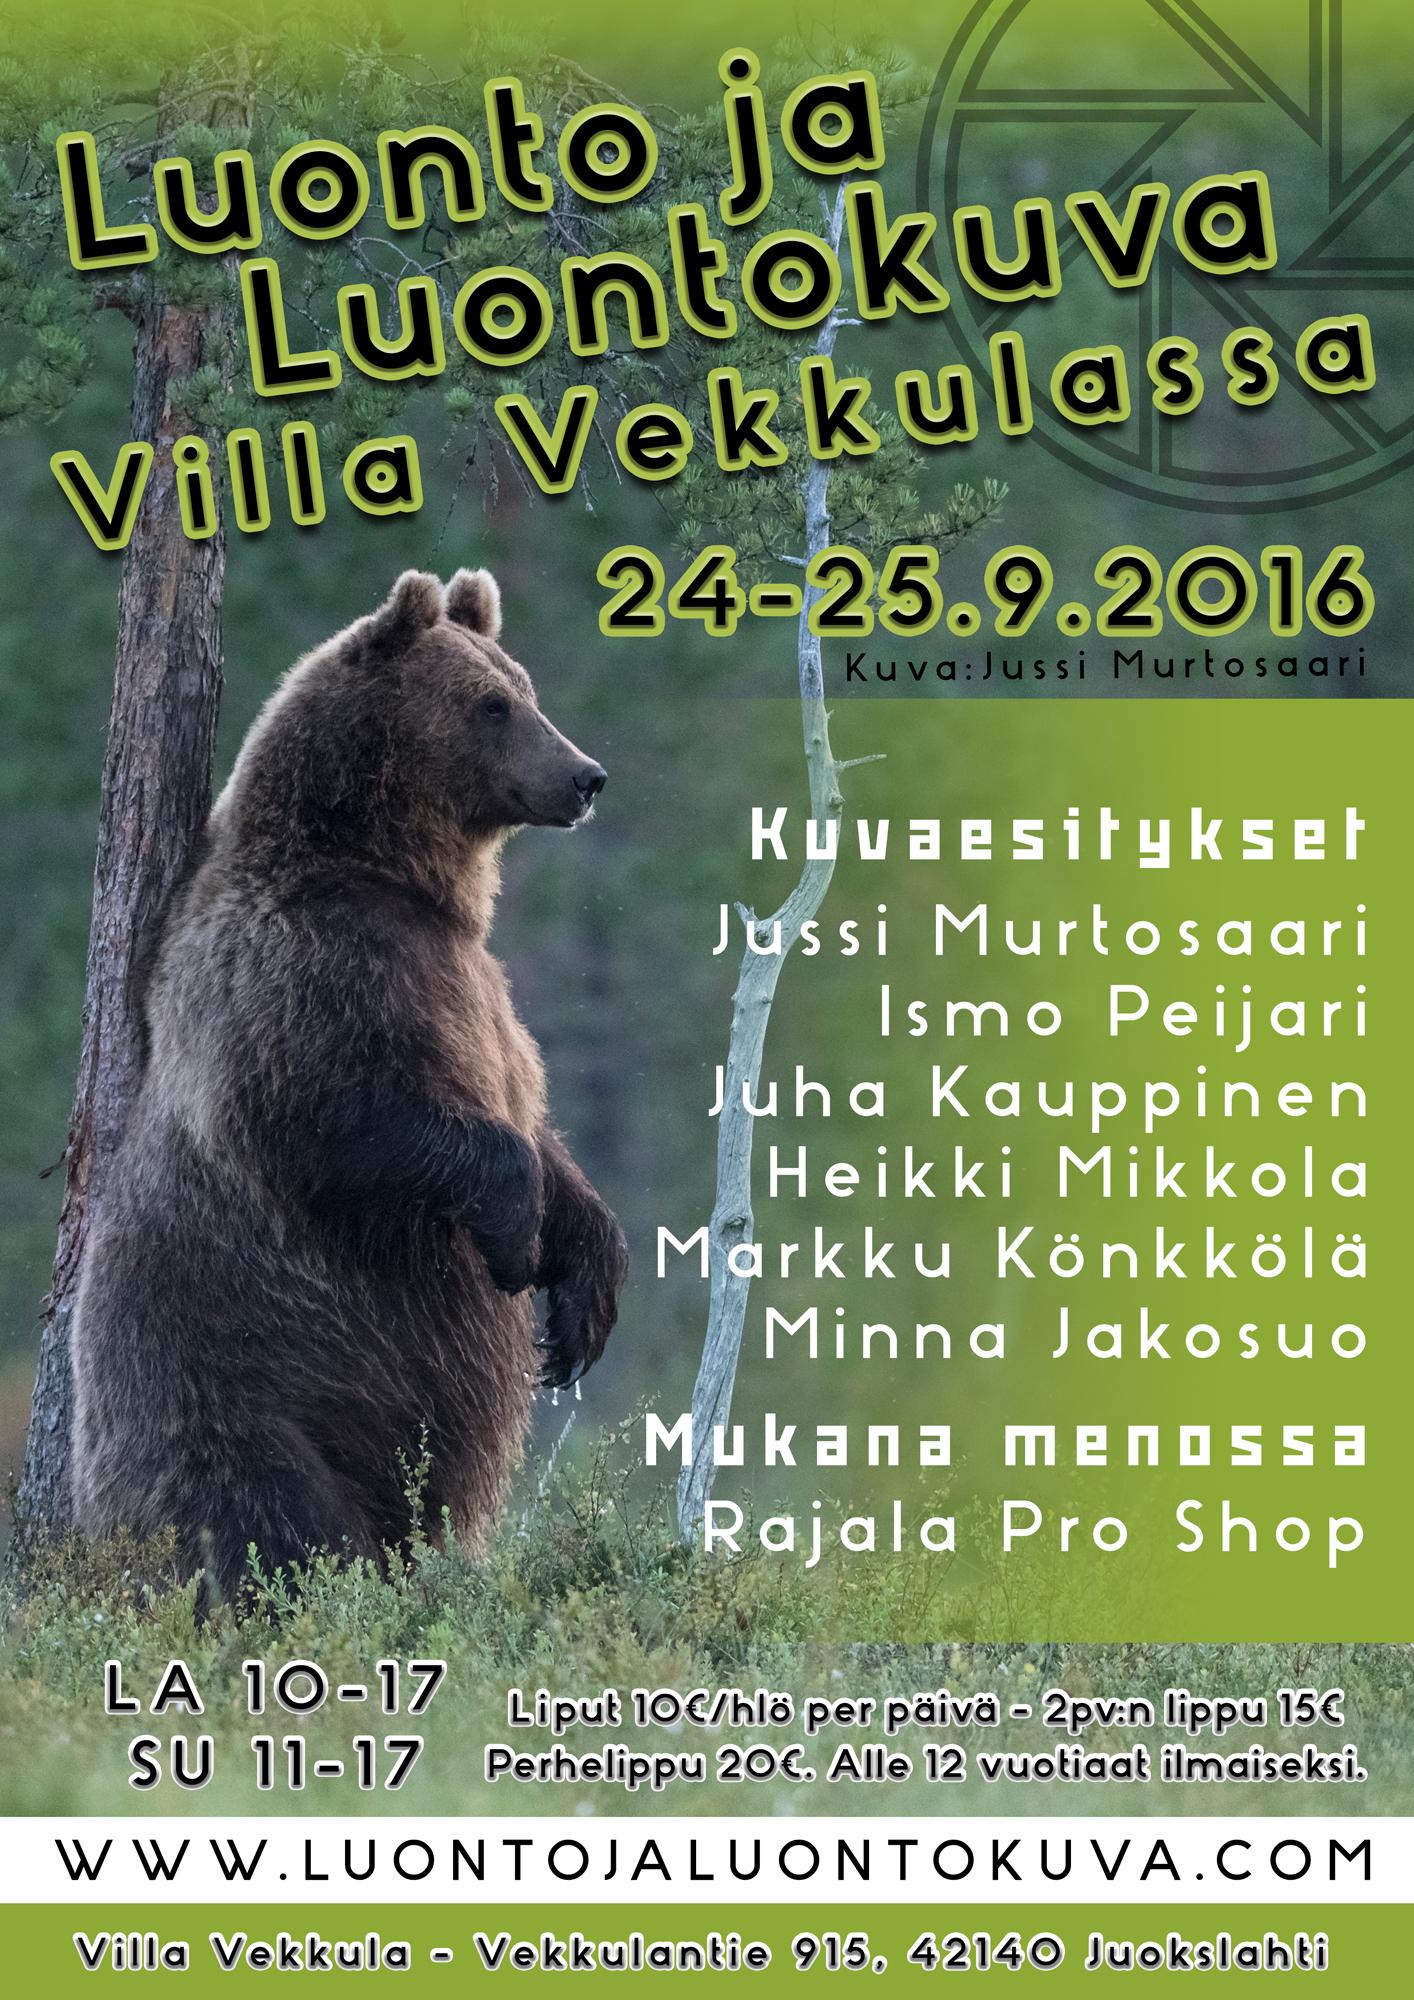 luontokuvamainos2016(1)